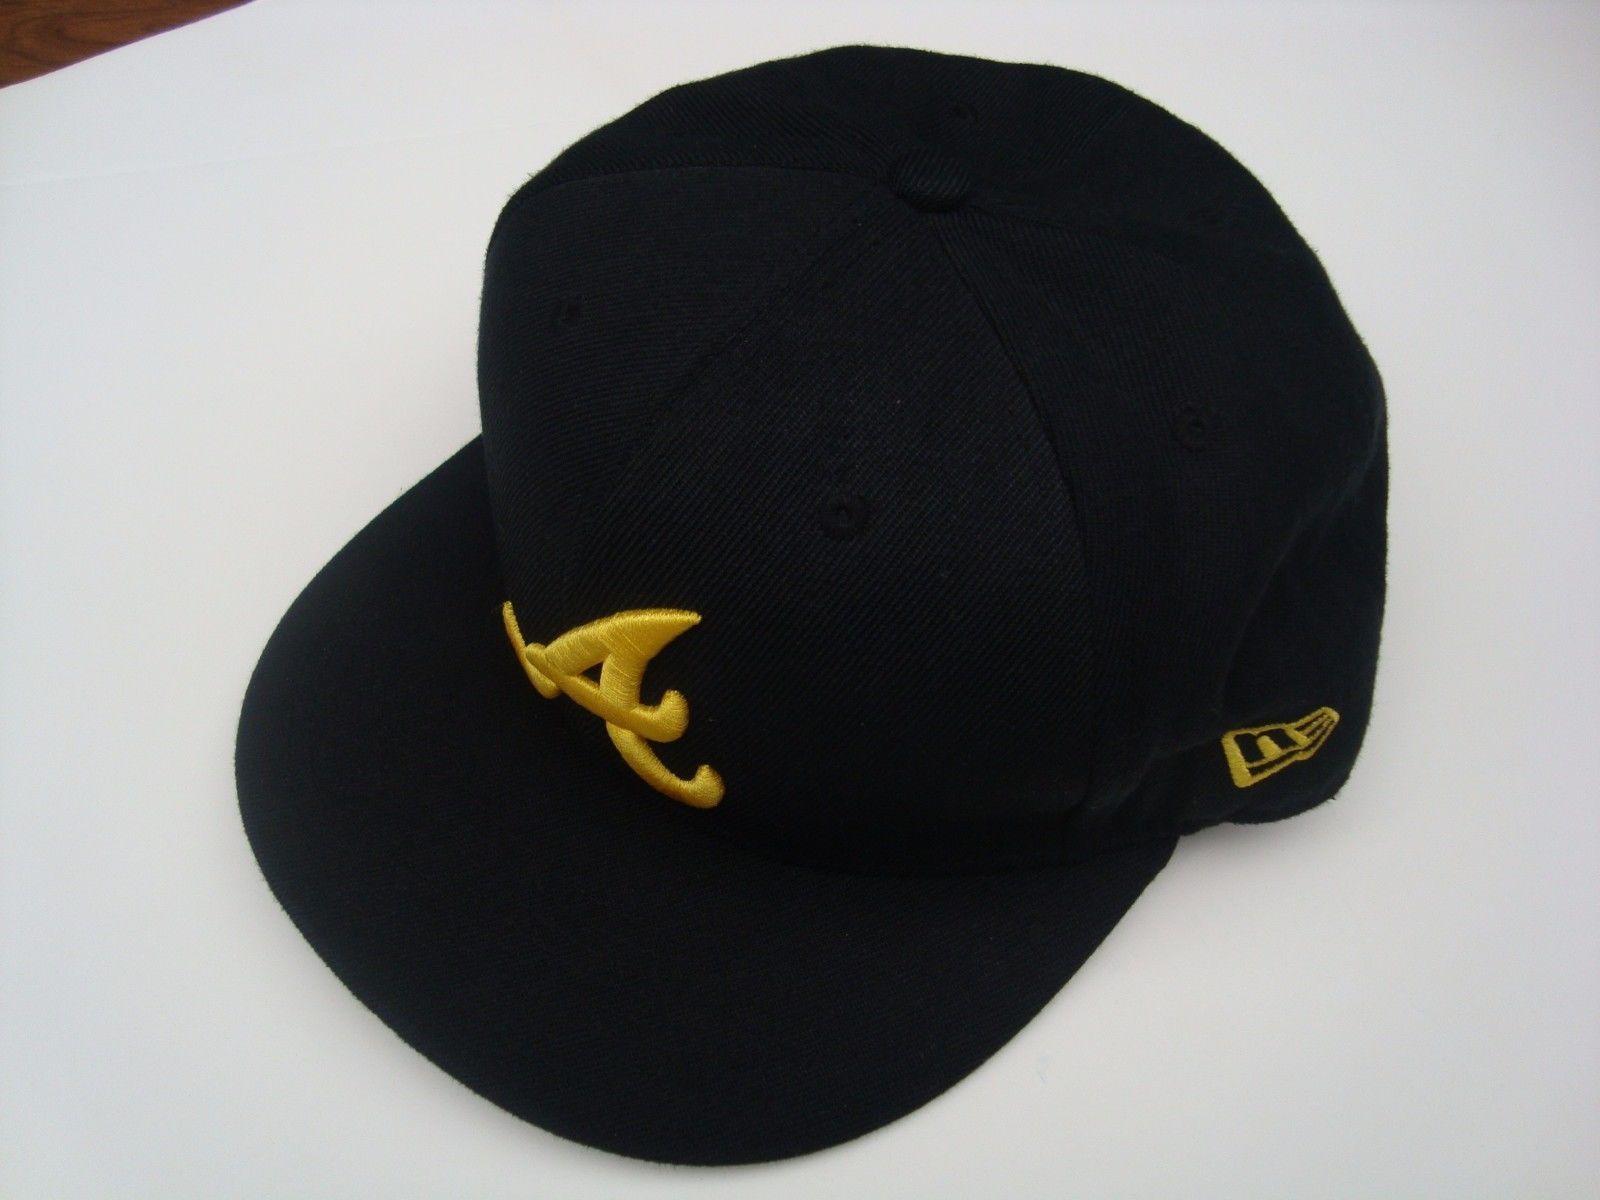 79e466e4e59 ... spain ebay baseball hats rare new era 59 fifty atlanta braves baseball  cap black w gold